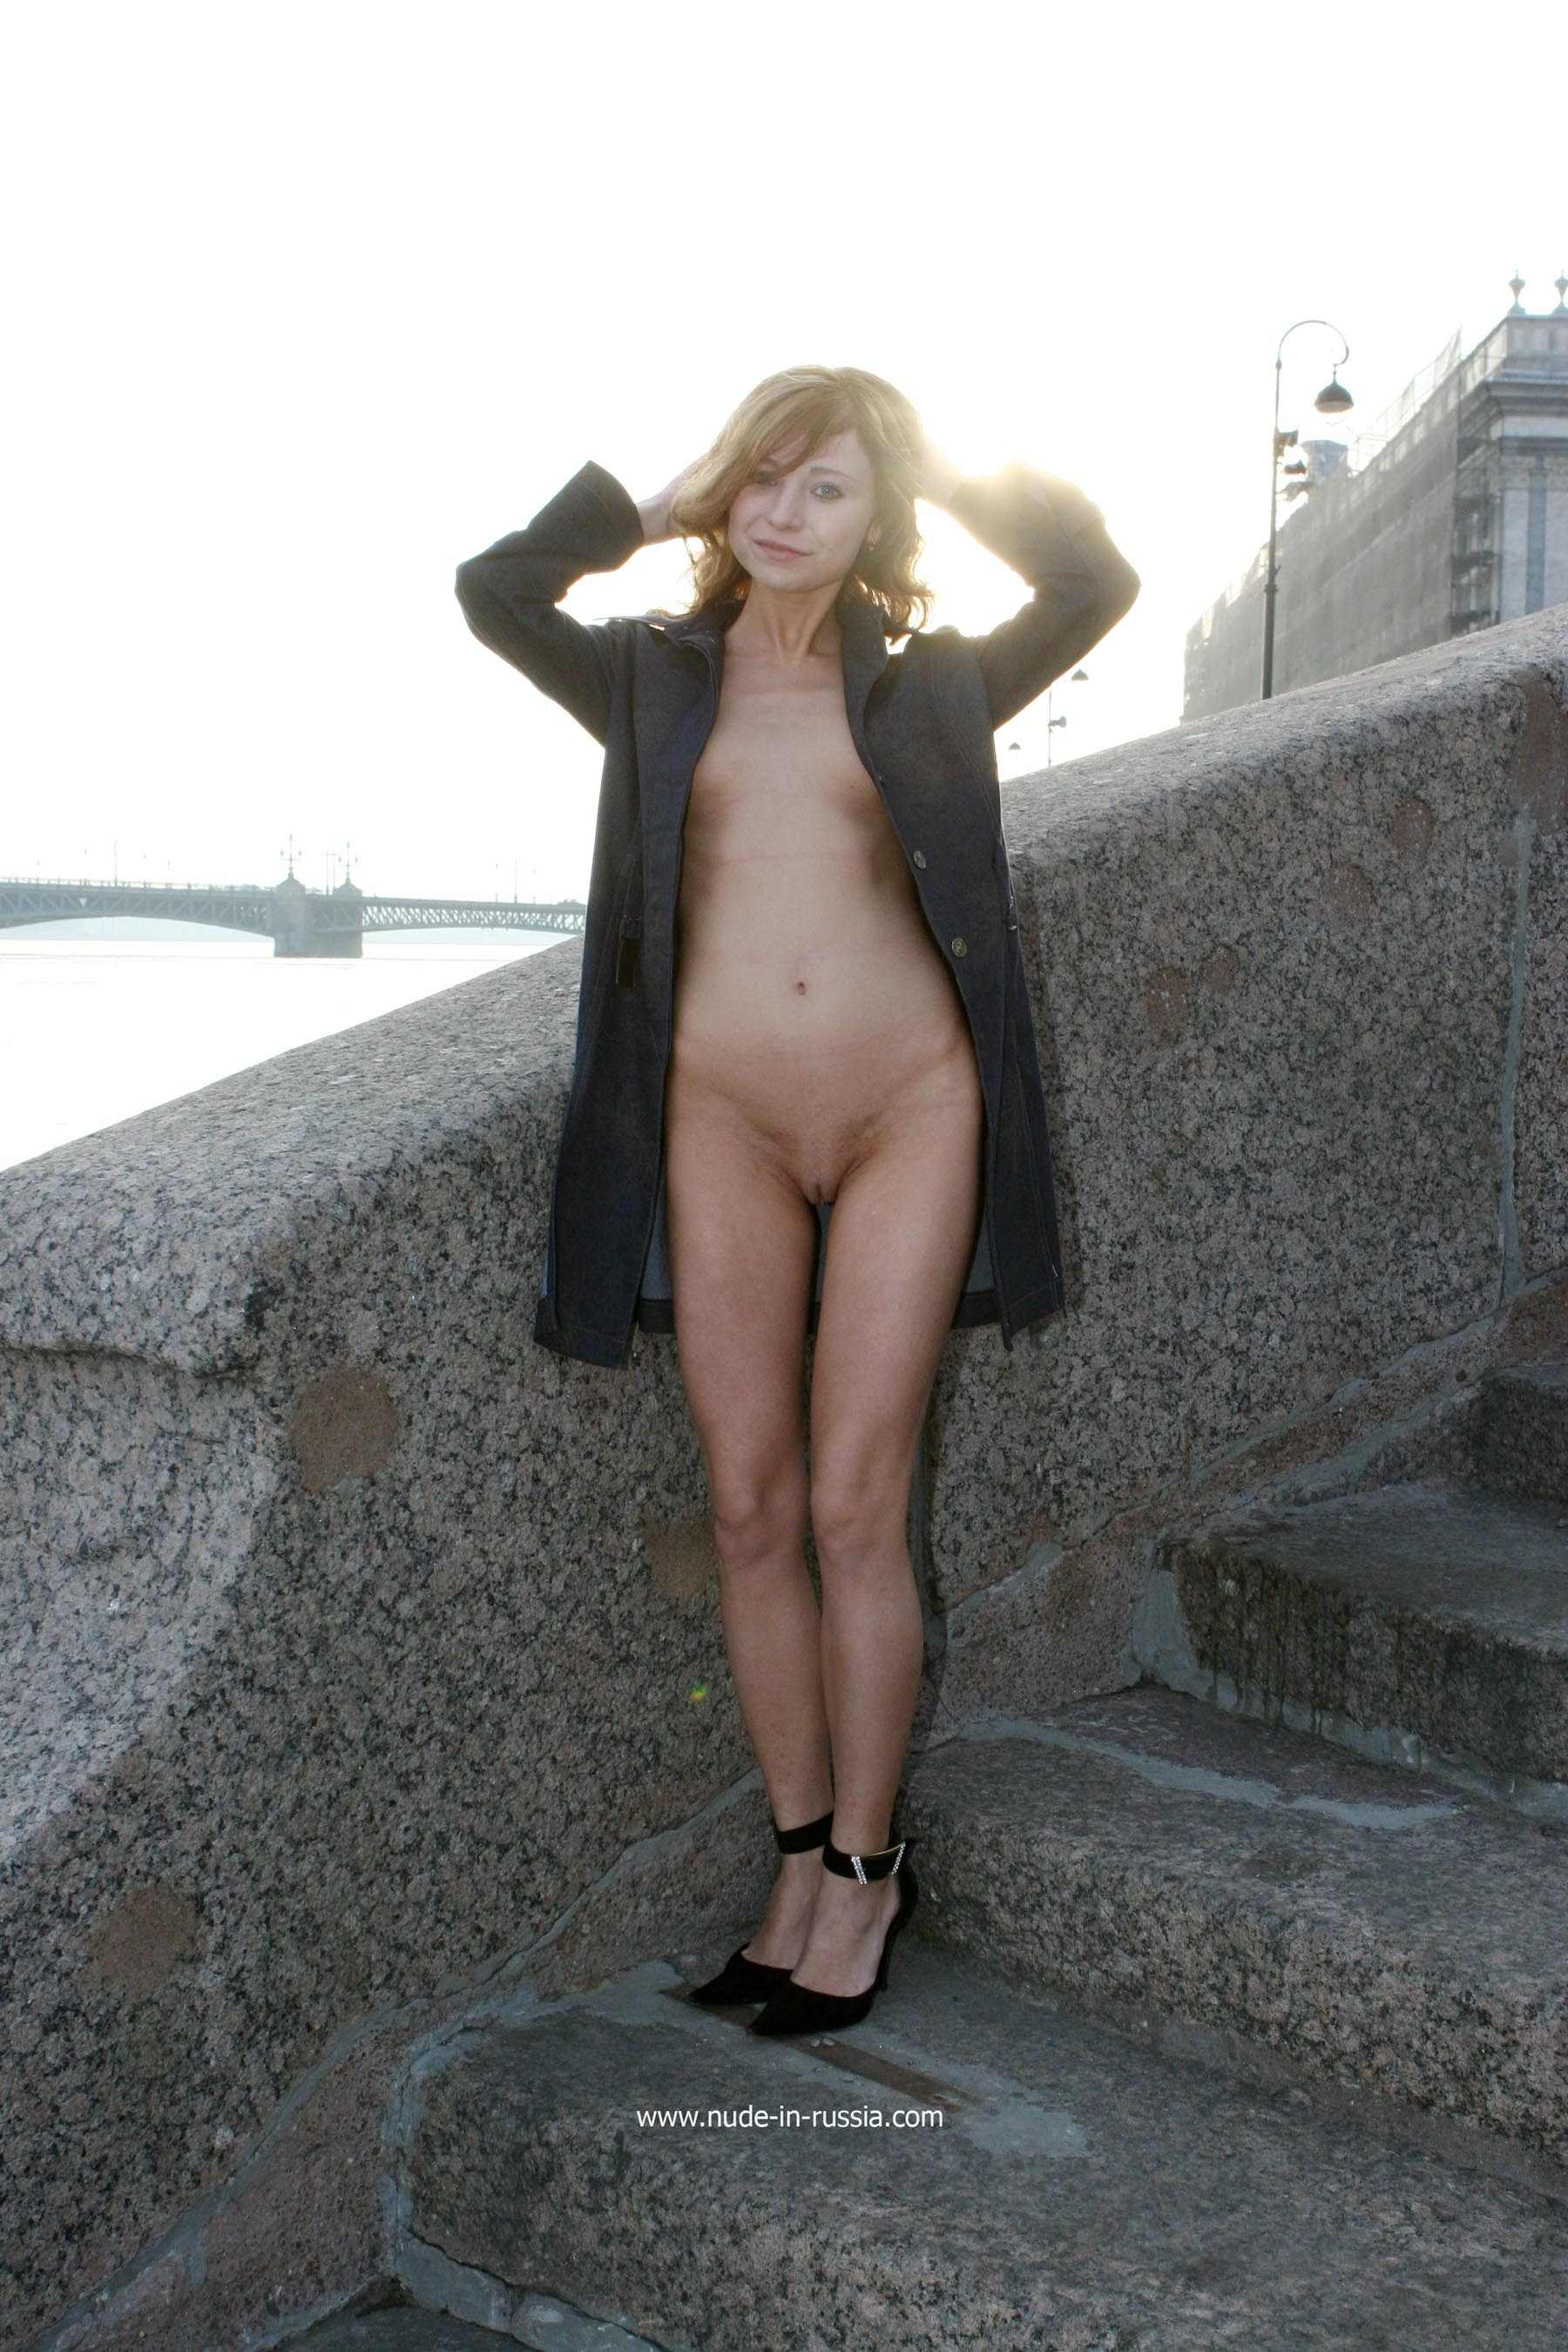 Sex Anna Park Nude Pics